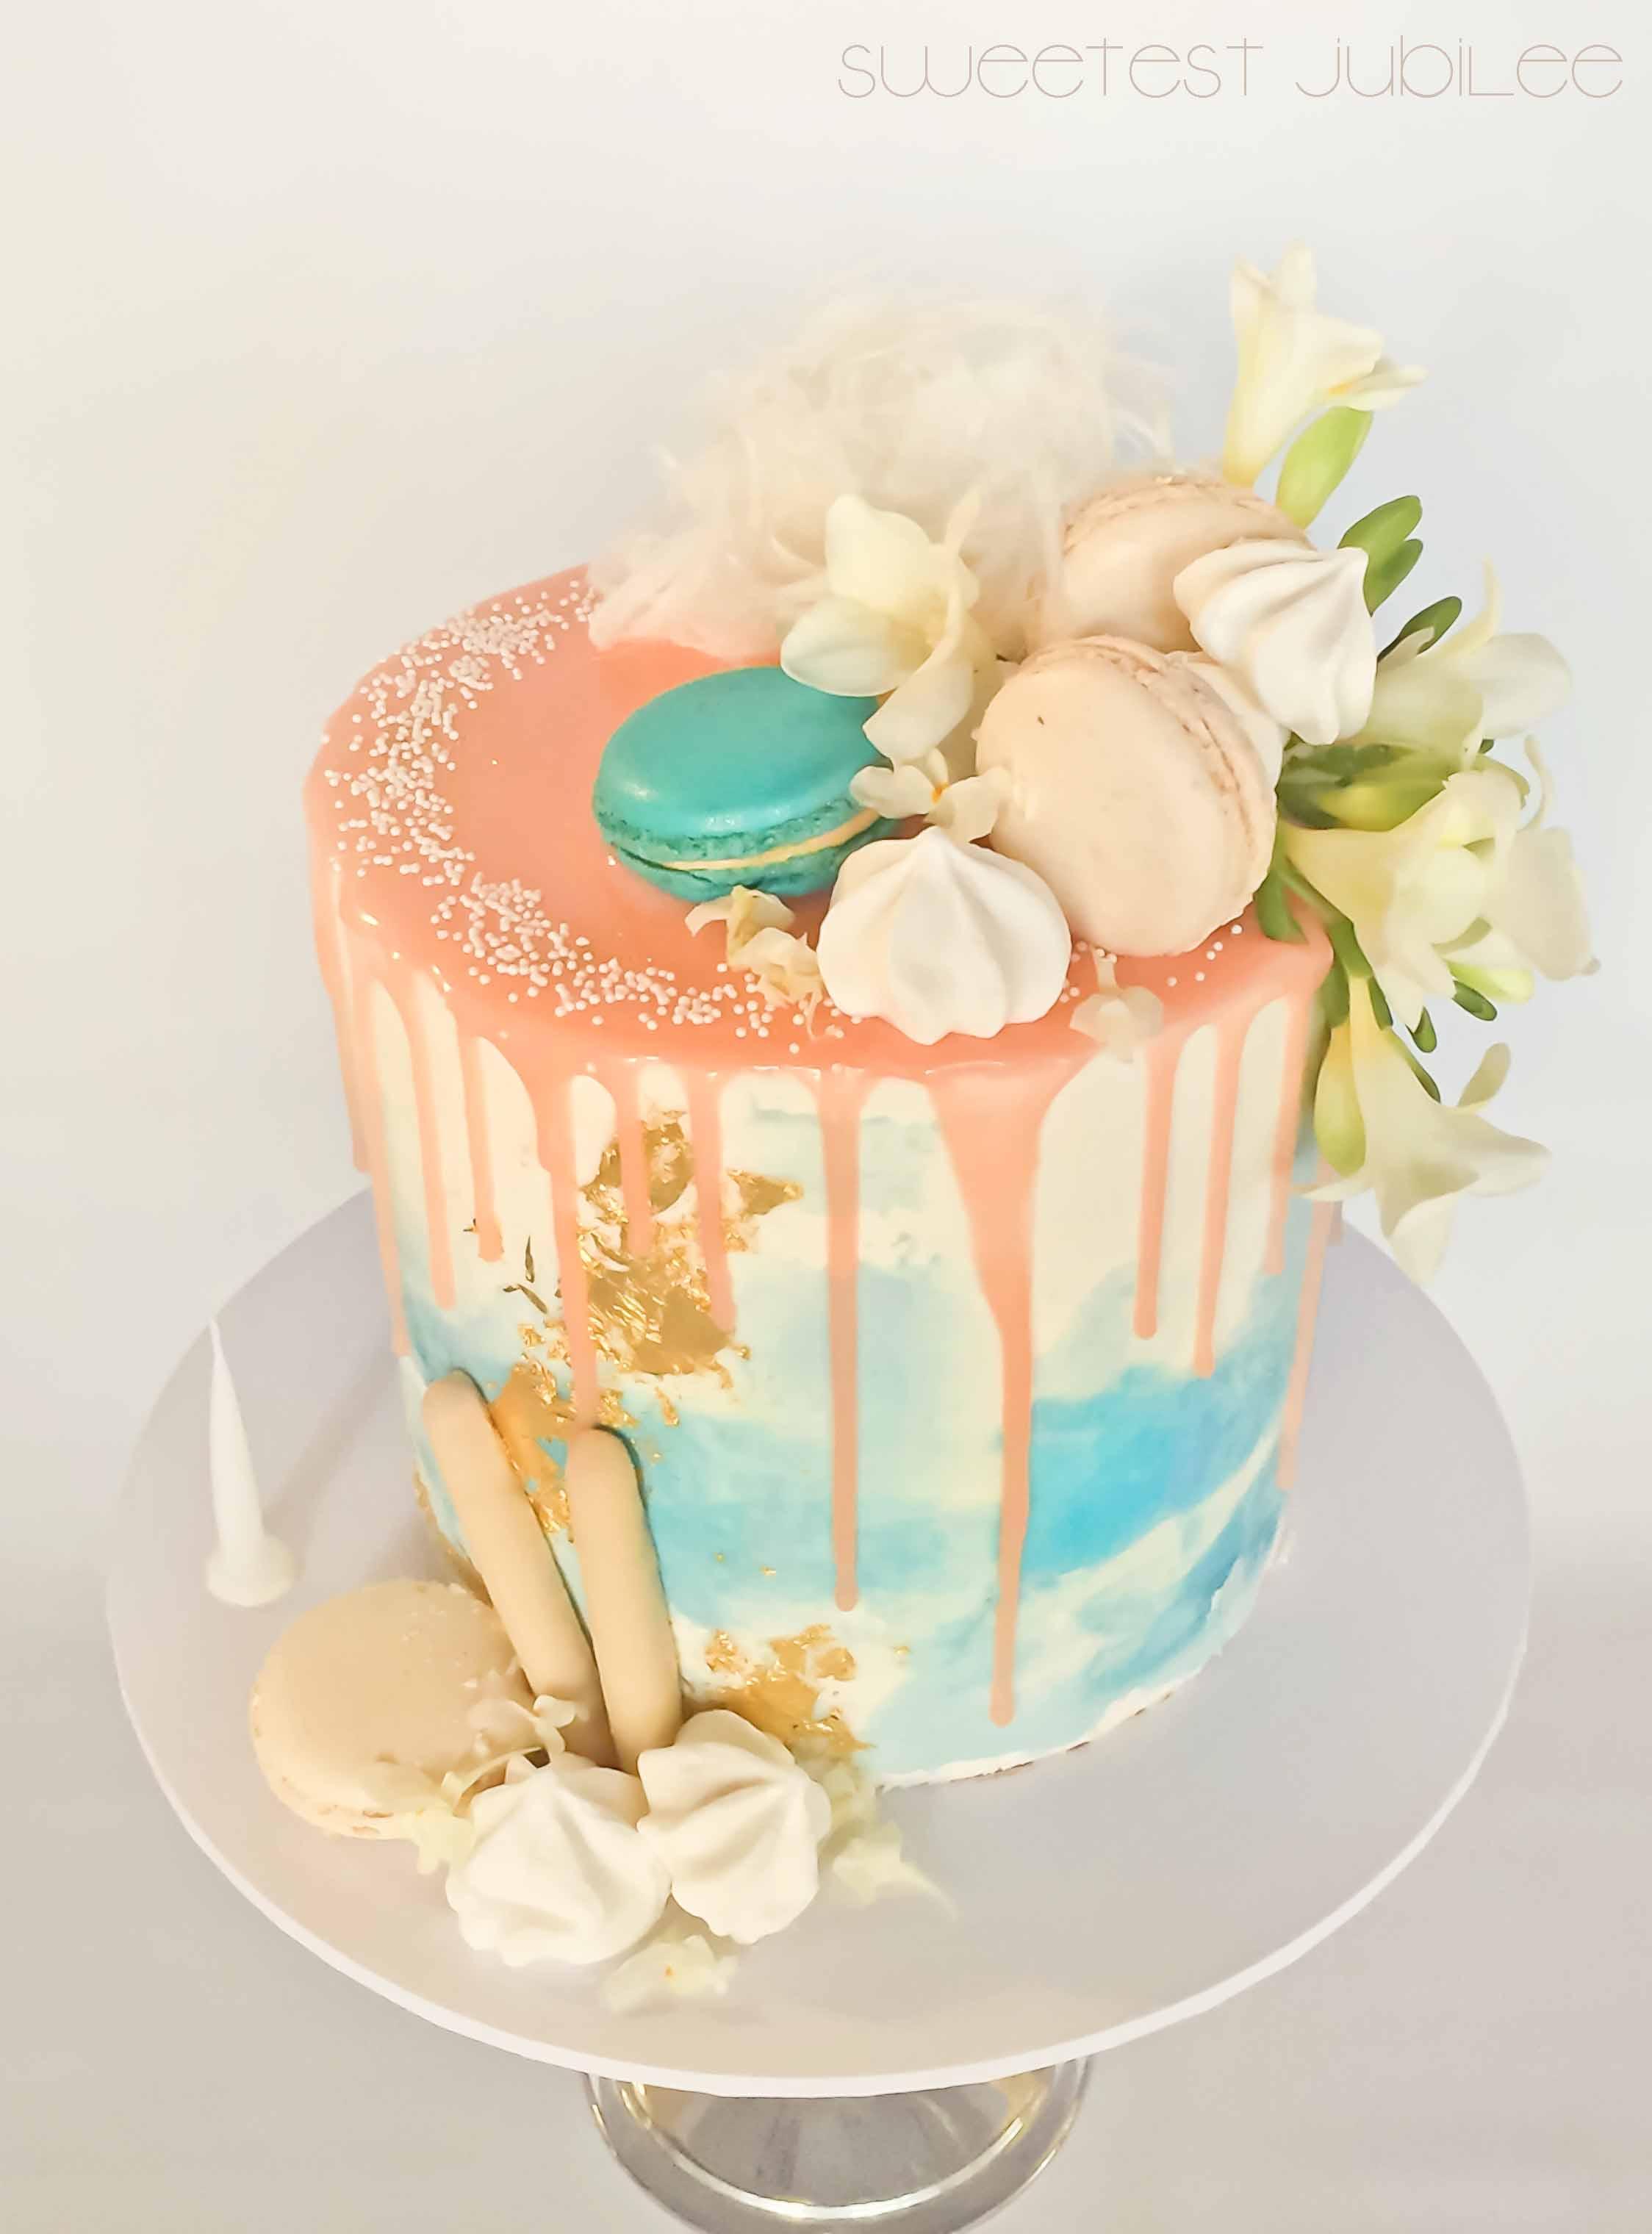 Lanes cake edited.jpg